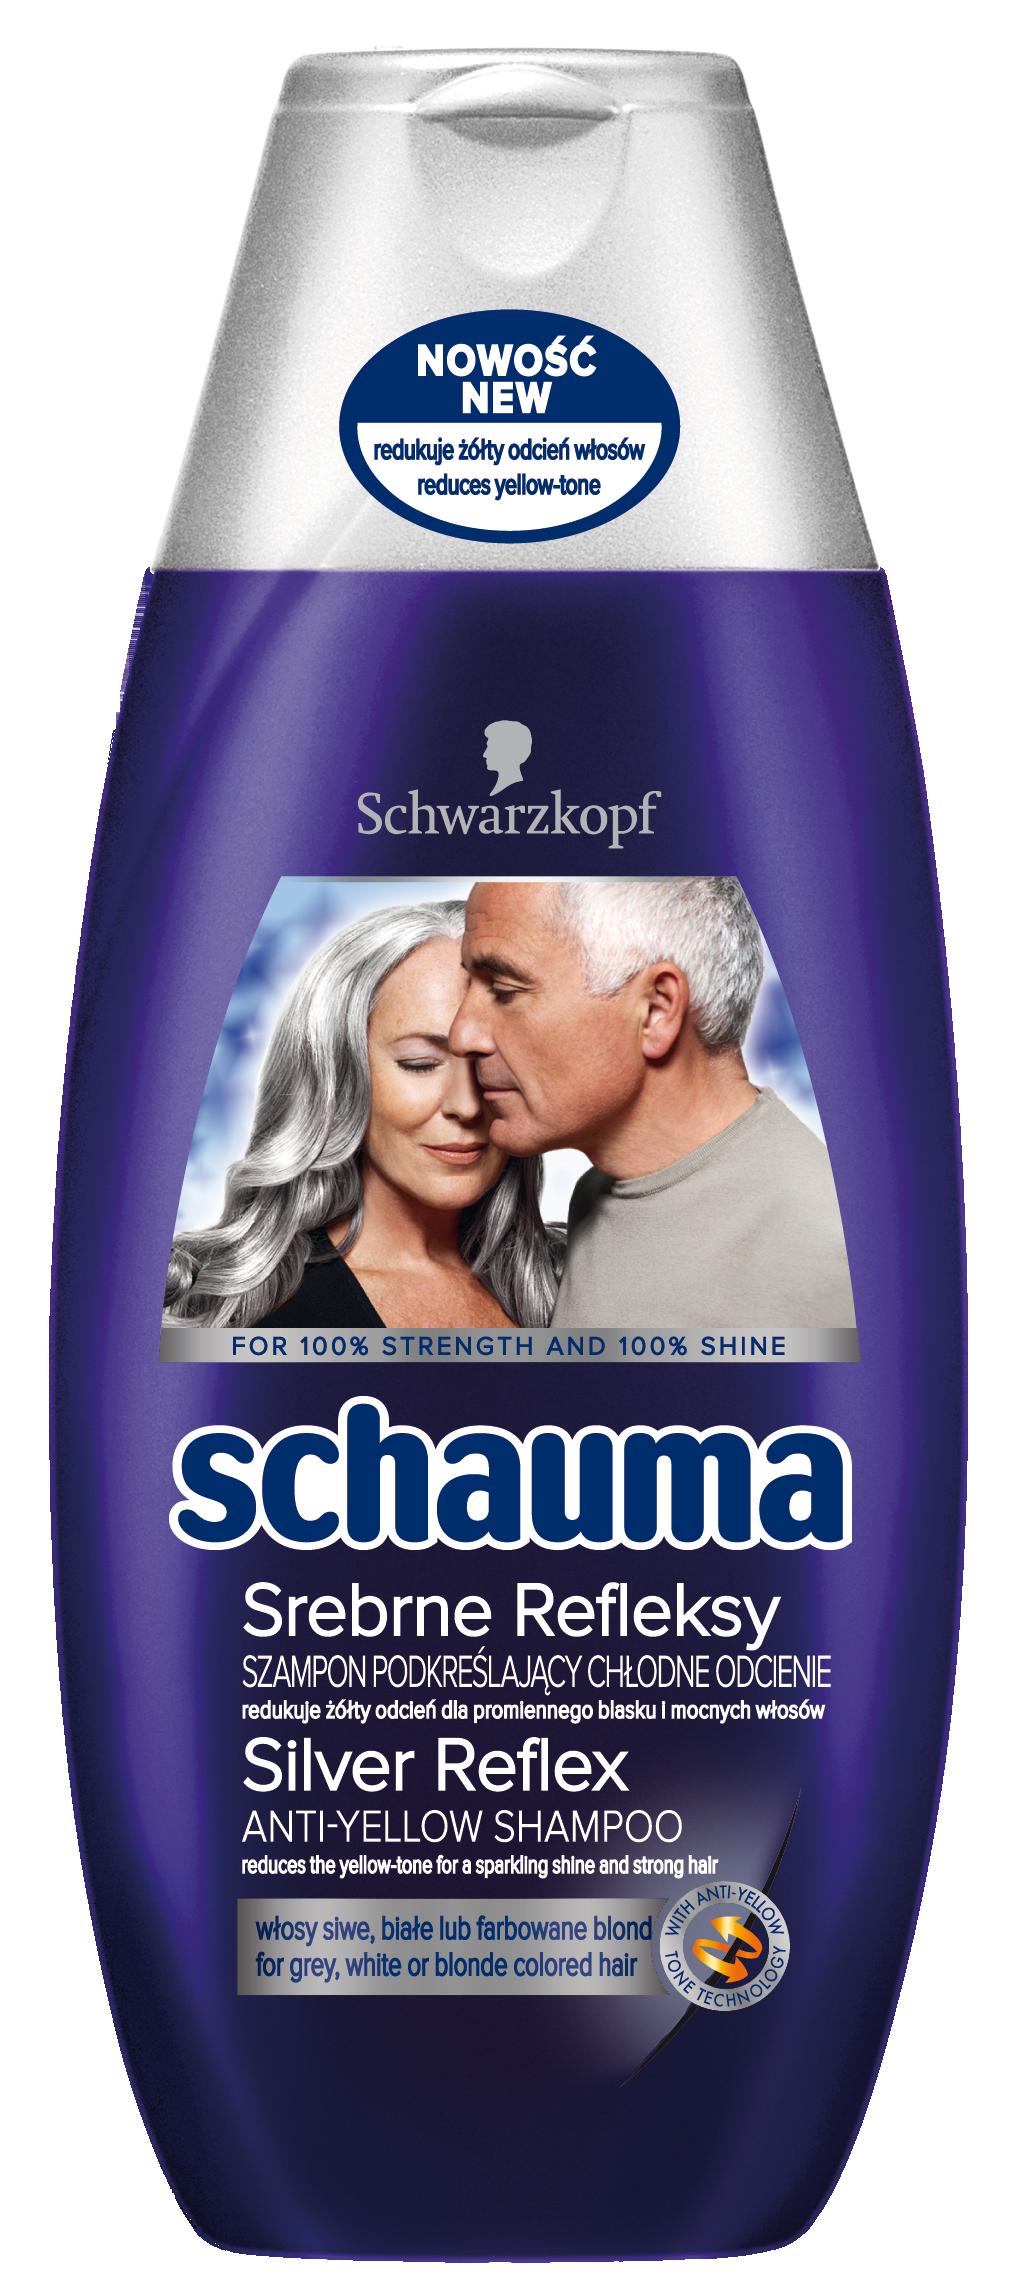 Schauma_Srebrne_Refleksy_szampon_250_m